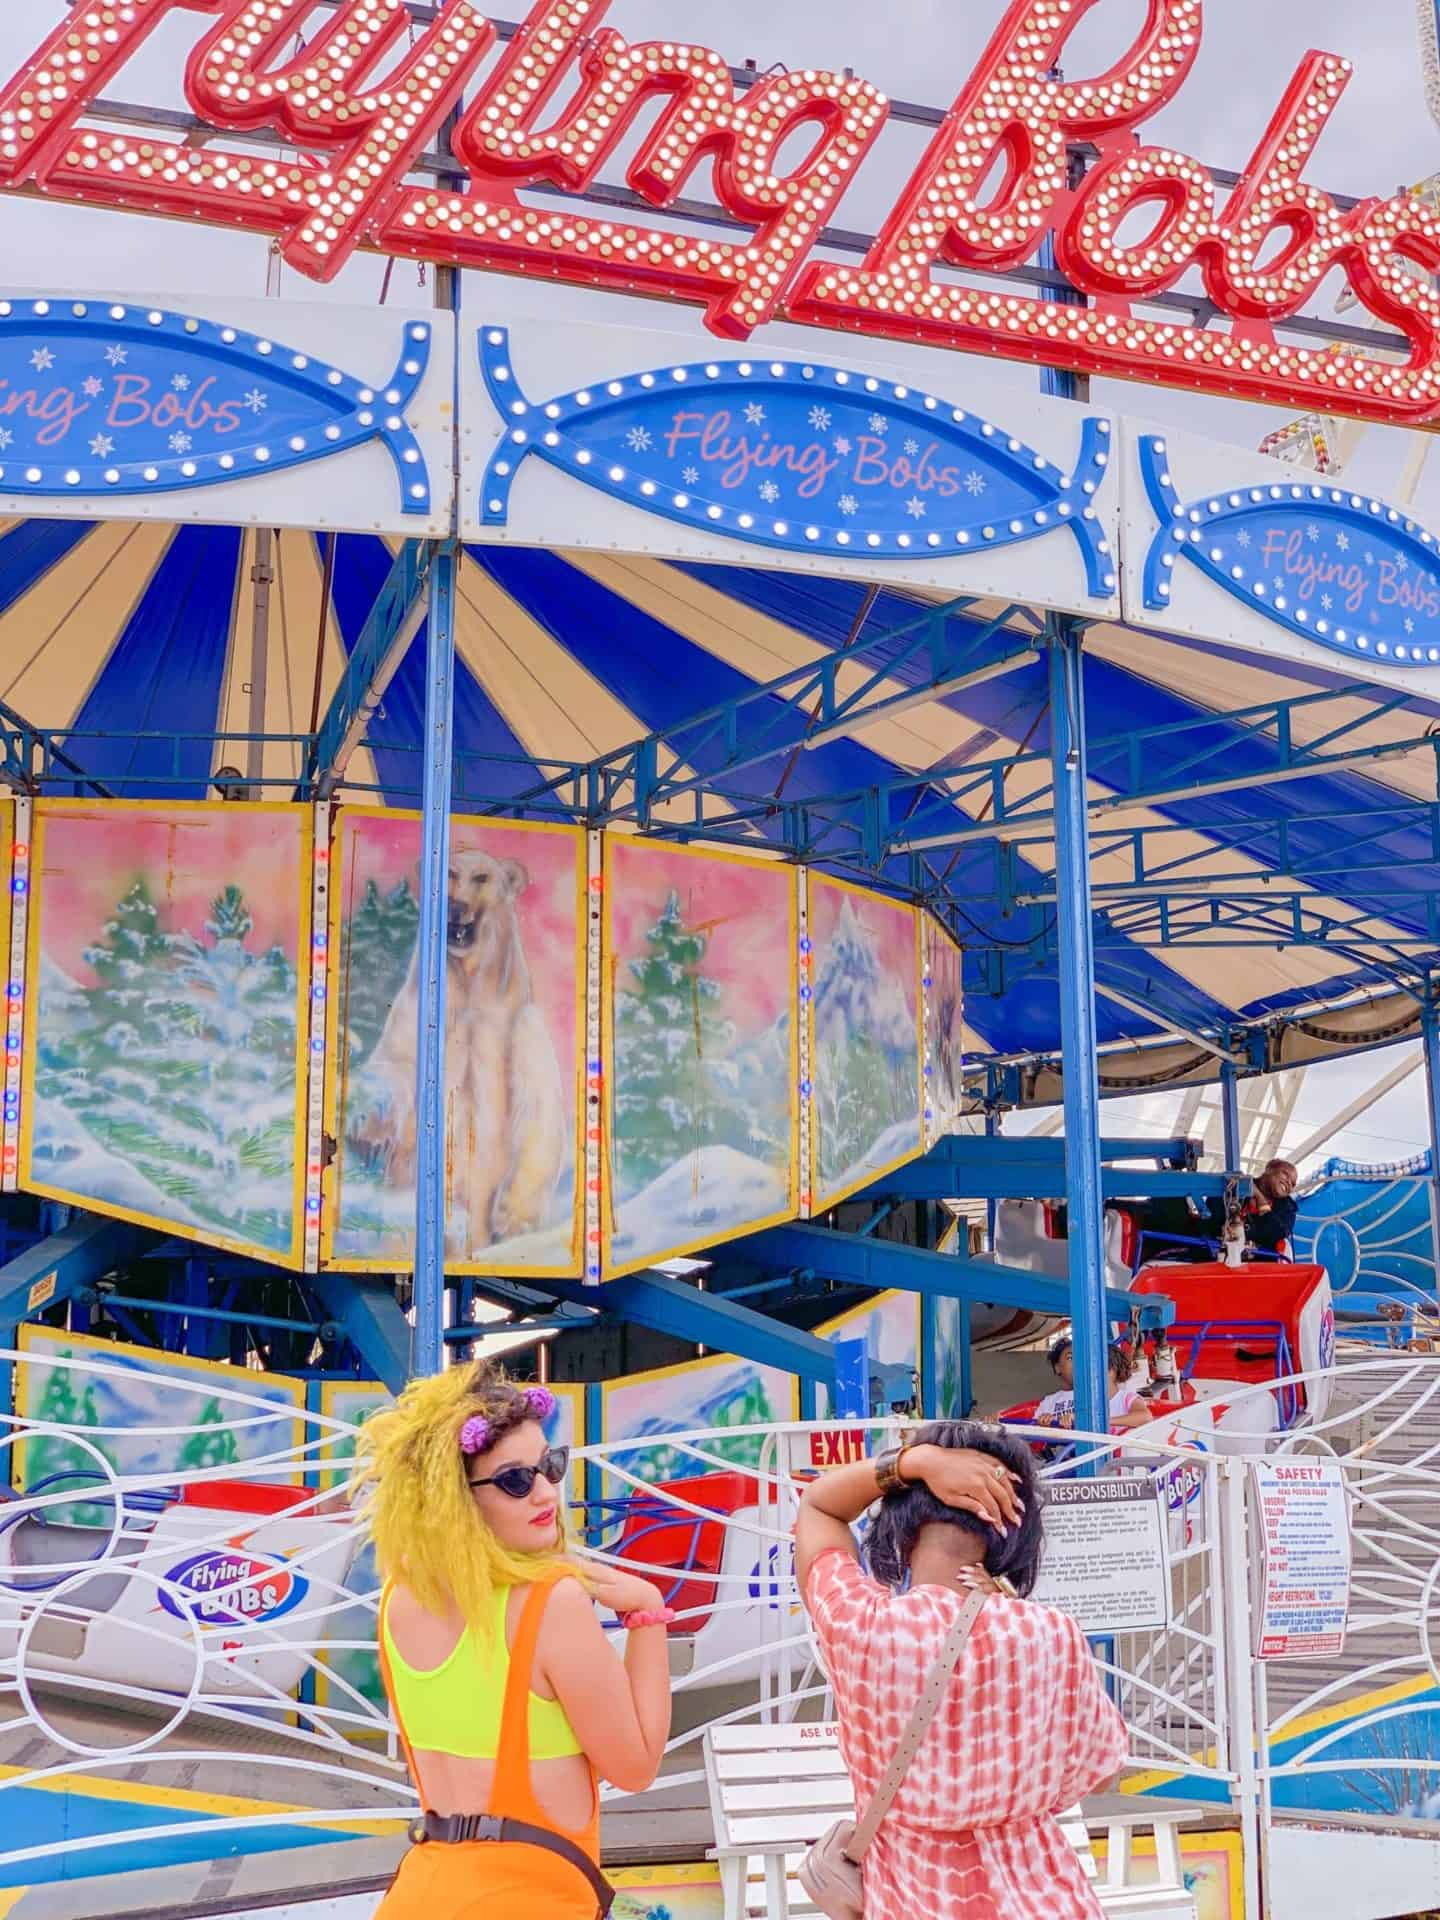 ShaundaNecole.com Something In The Water Fest- VA Beach Oceanfront Fun Park Flying Bobs